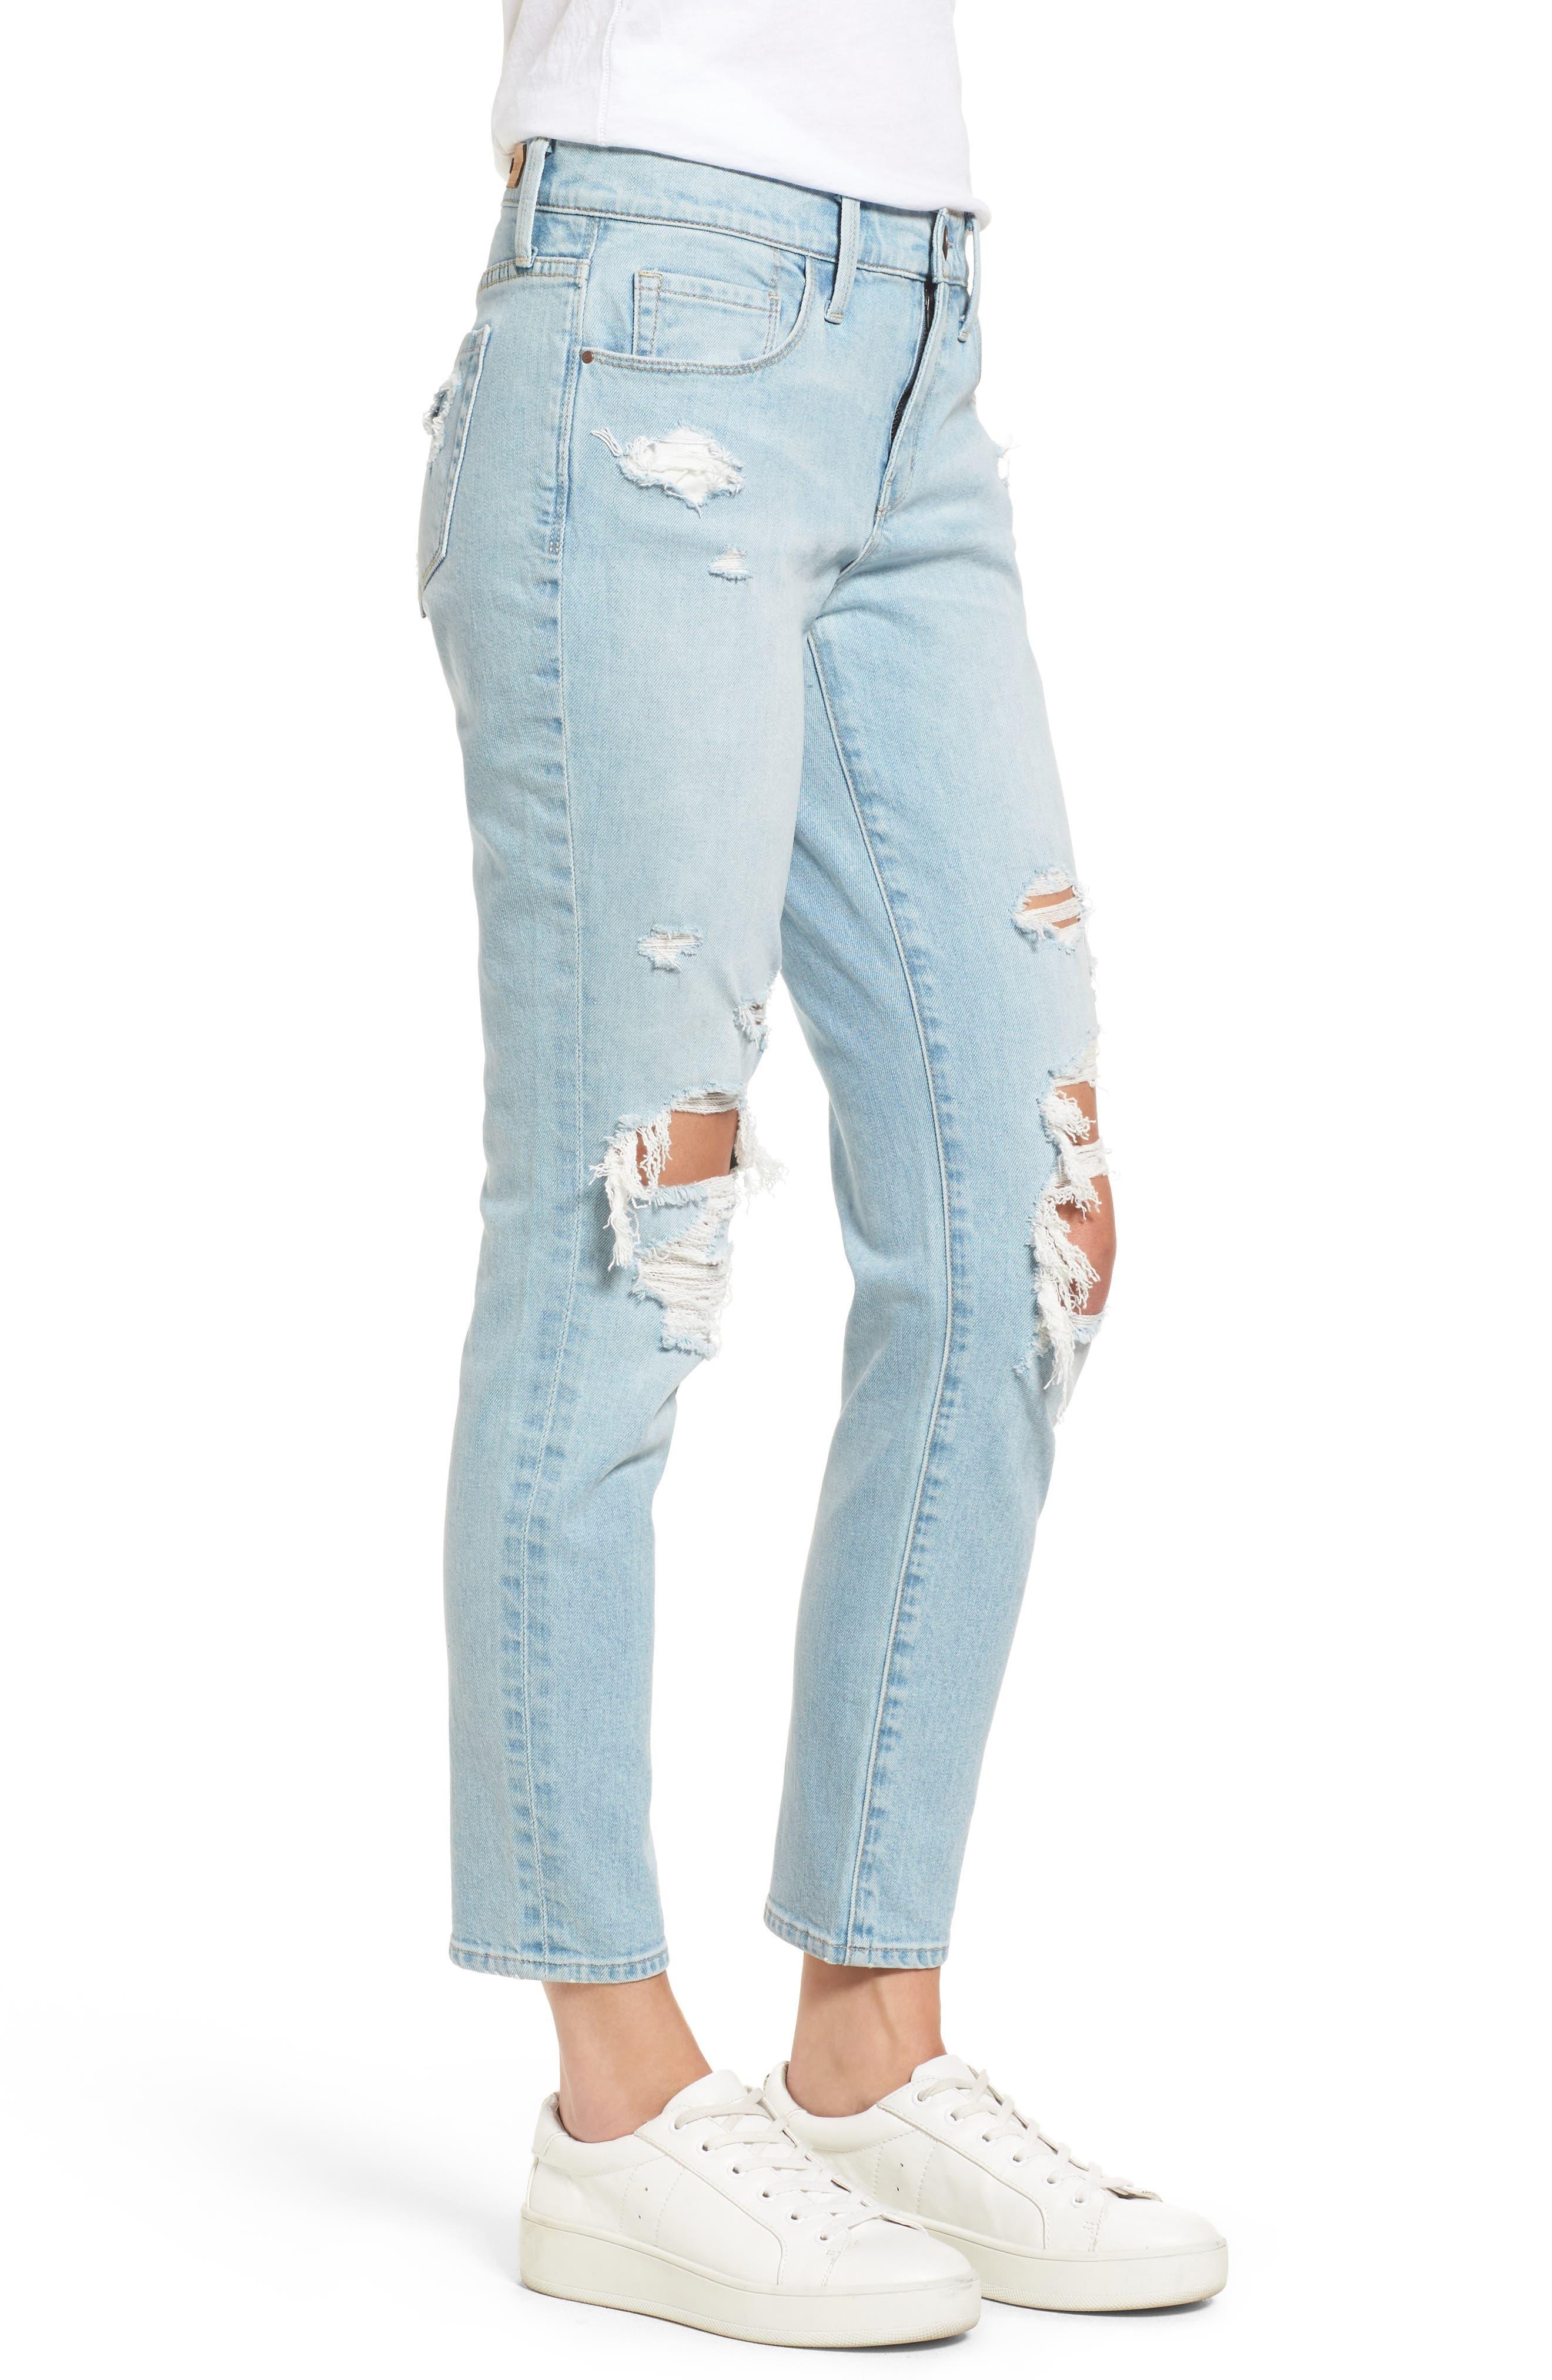 TREASURE & BOND,                             Skinny Boyfriend Jeans,                             Alternate thumbnail 3, color,                             400